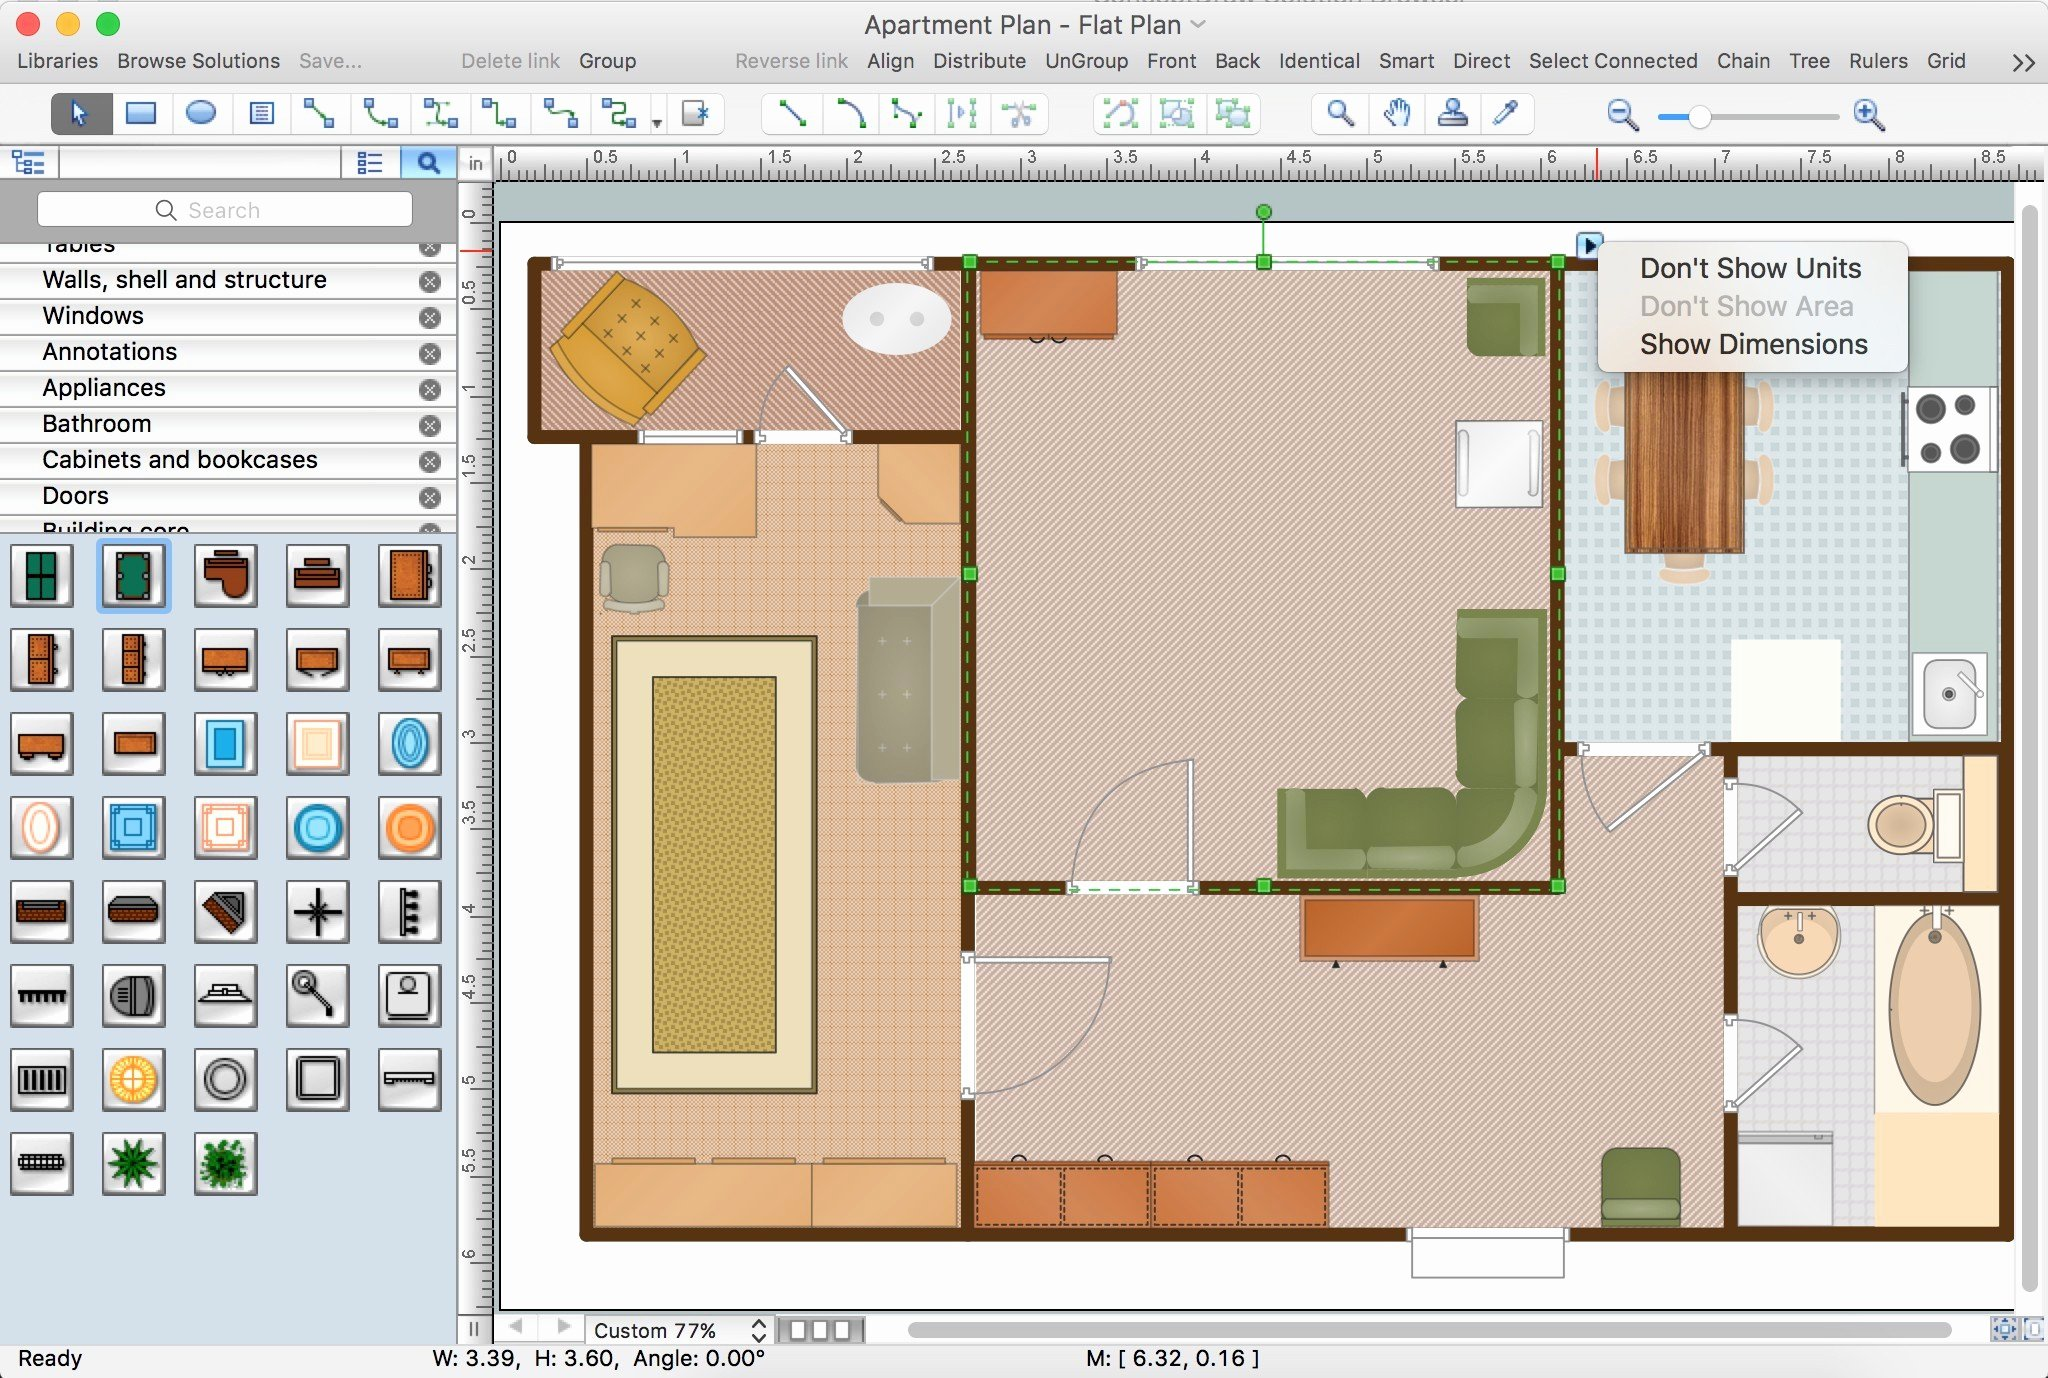 Free Evacuation Floor Plan Template Best Of Free Evacuation Floor Plan Template Unique How to Draw An